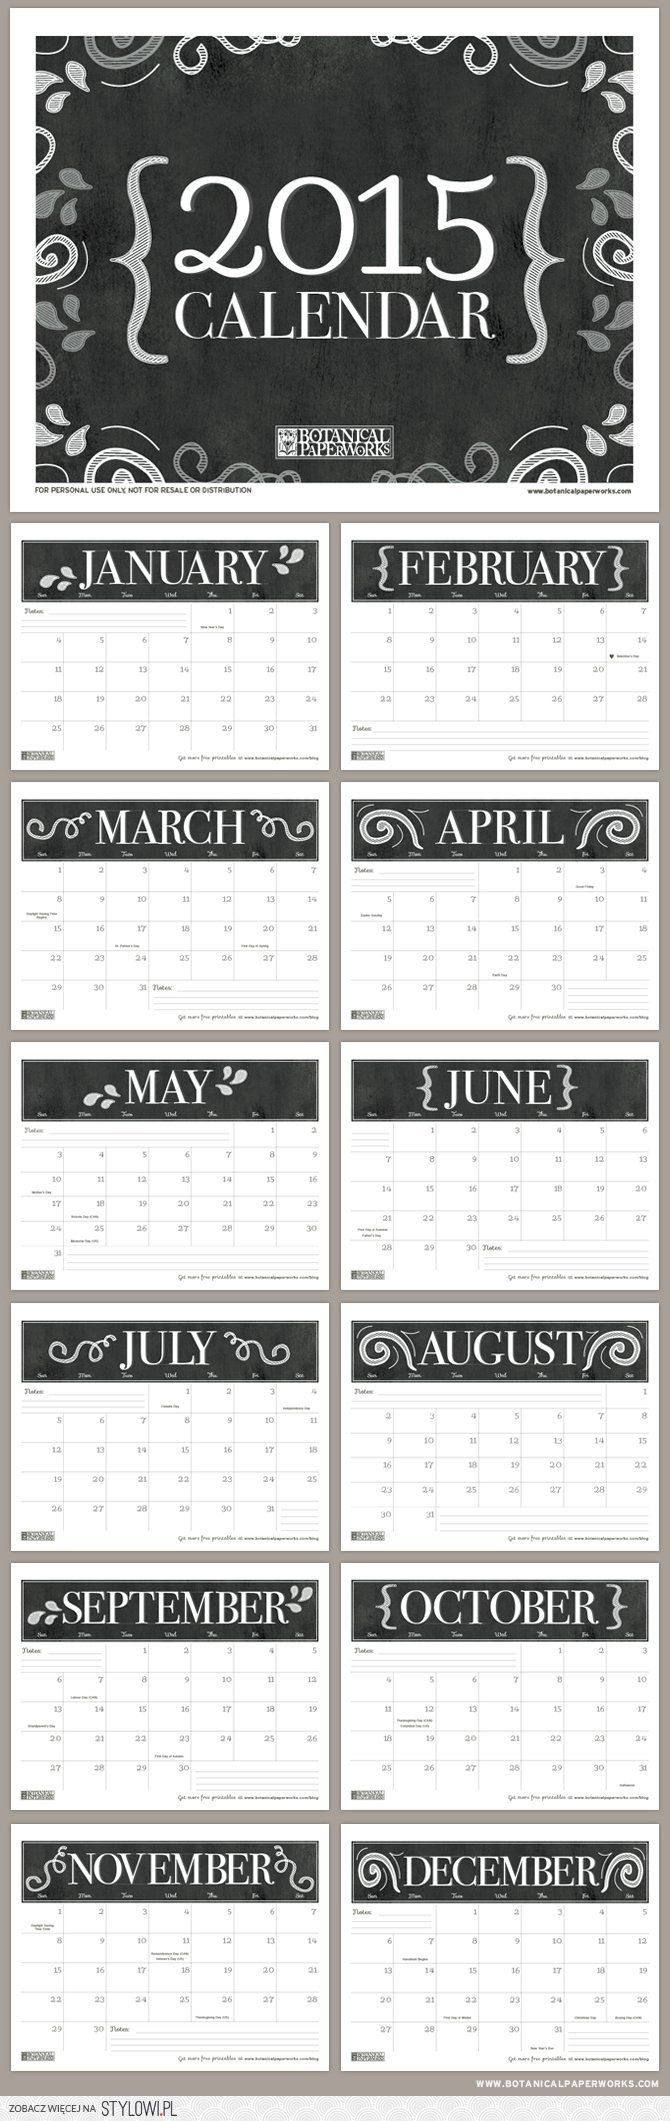 55 best free printable • calendar 2014-15 images on Pinterest | Free ...